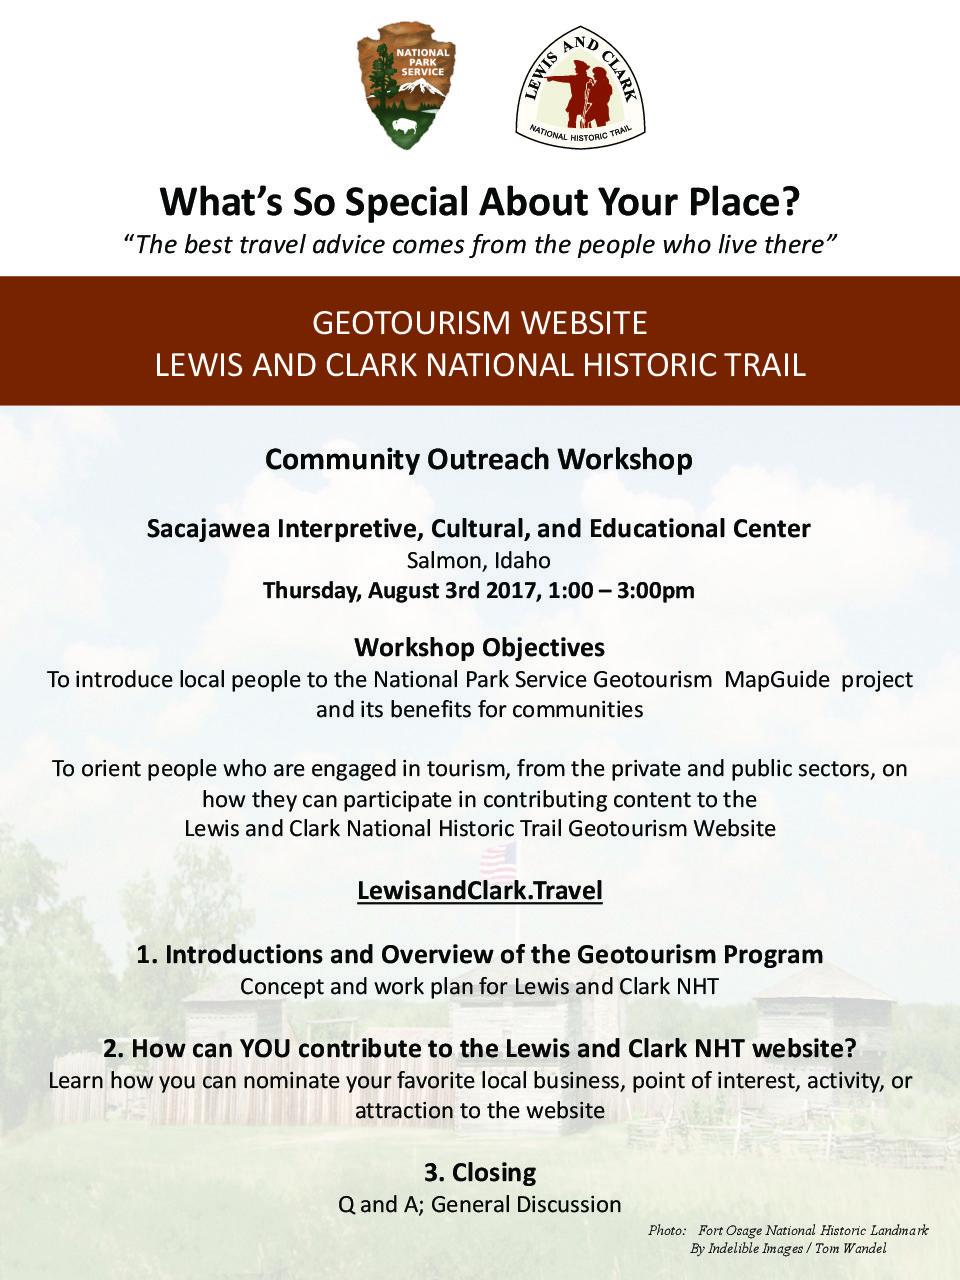 Lewis & Clark National Historic Trail Geotourism Workshop